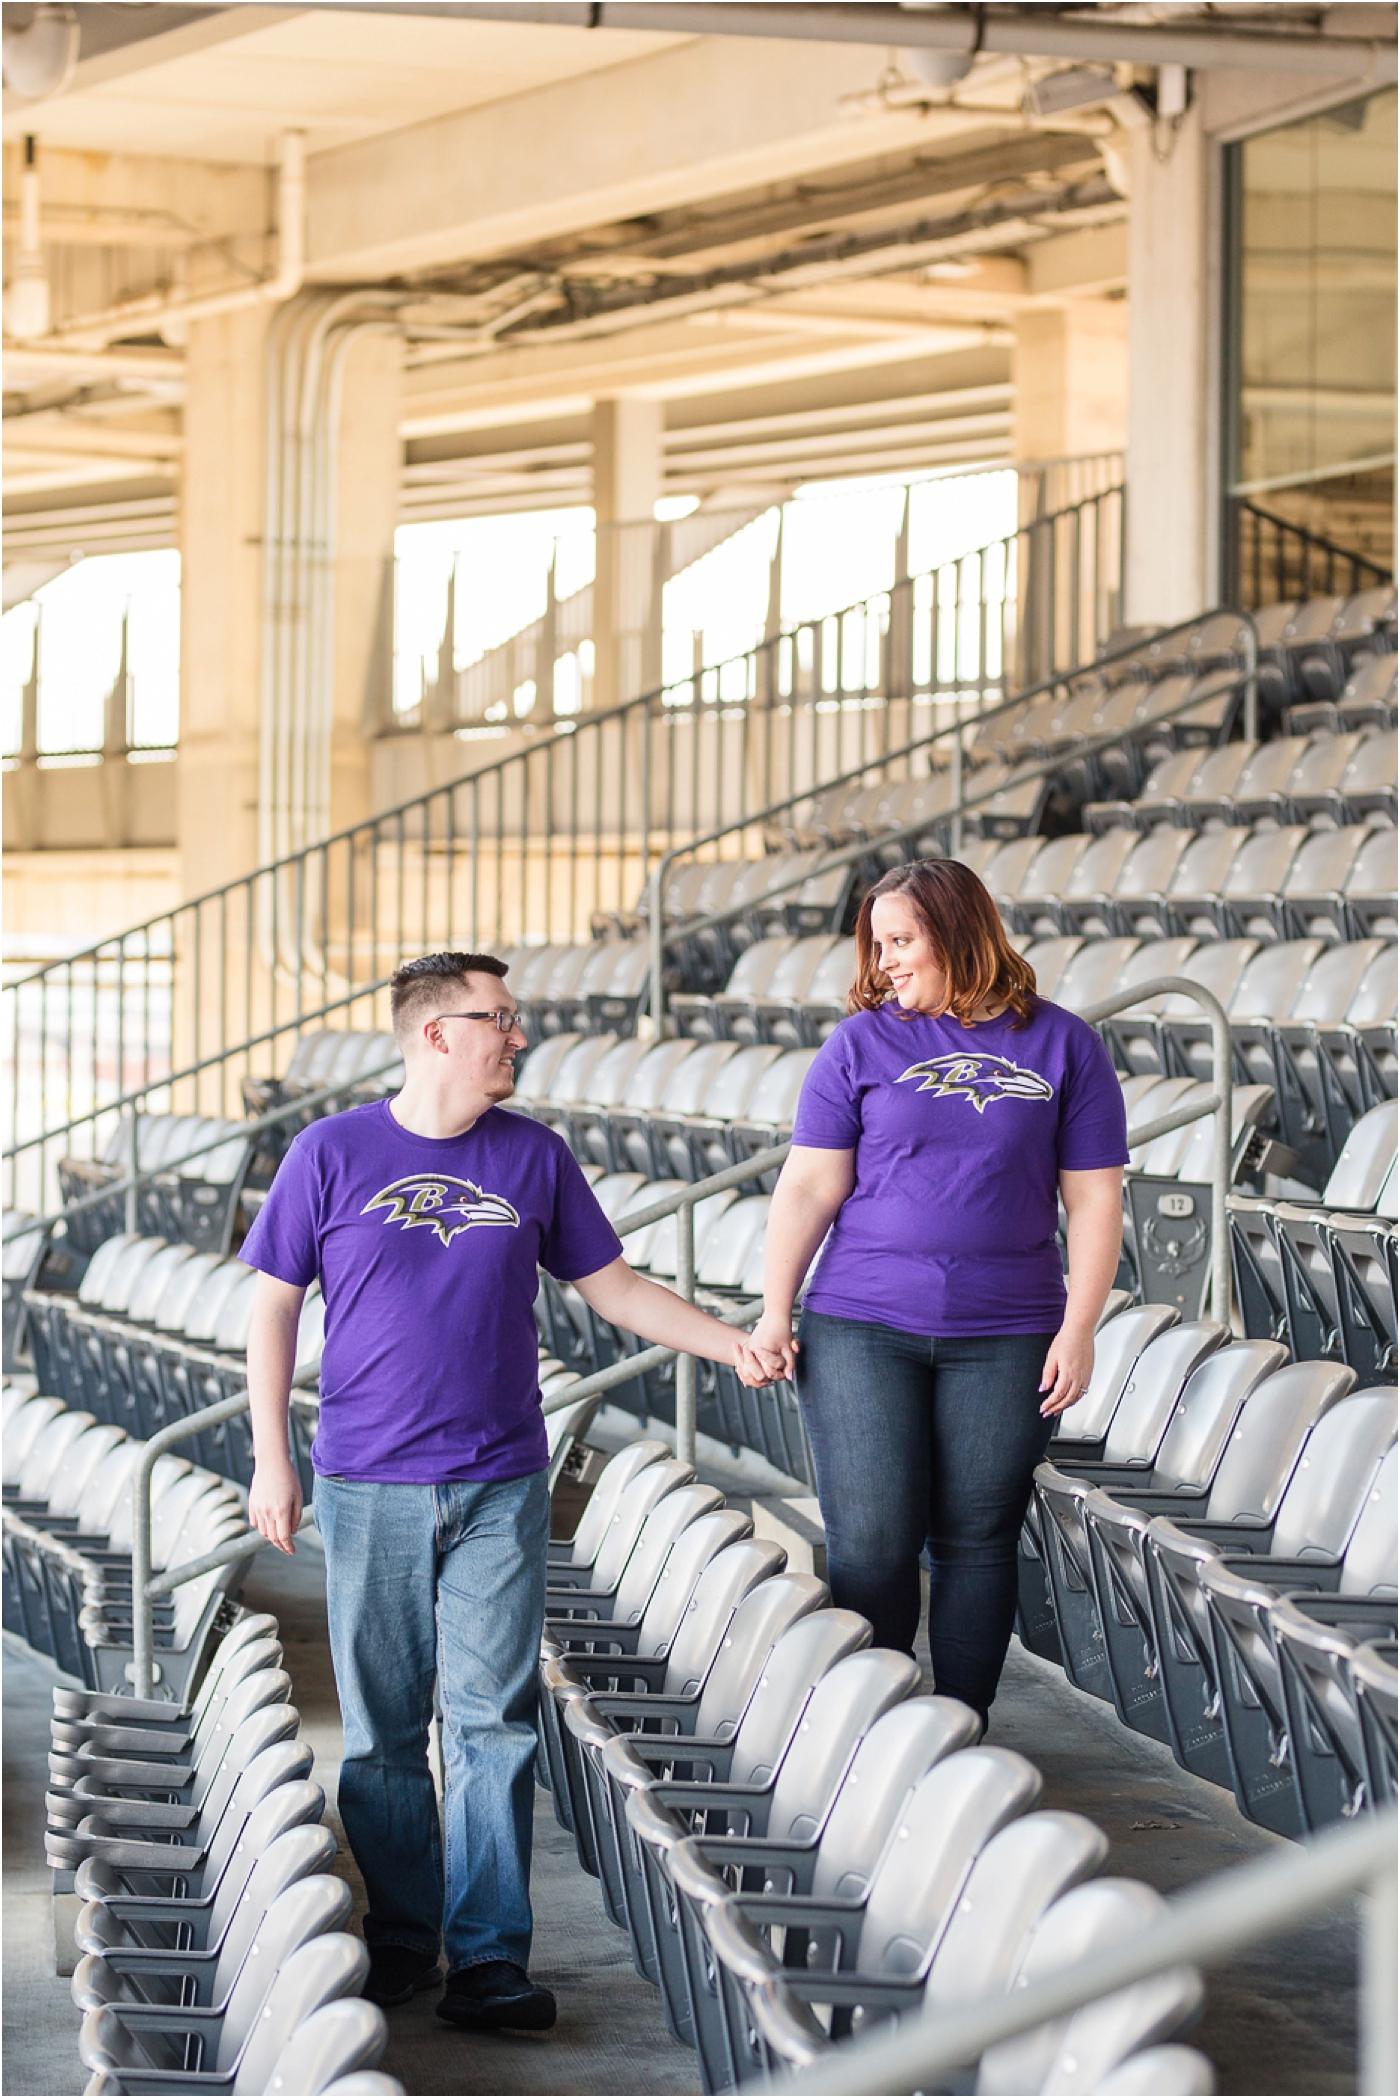 Ravens-Stadium-Engagement-Photos-16.jpg